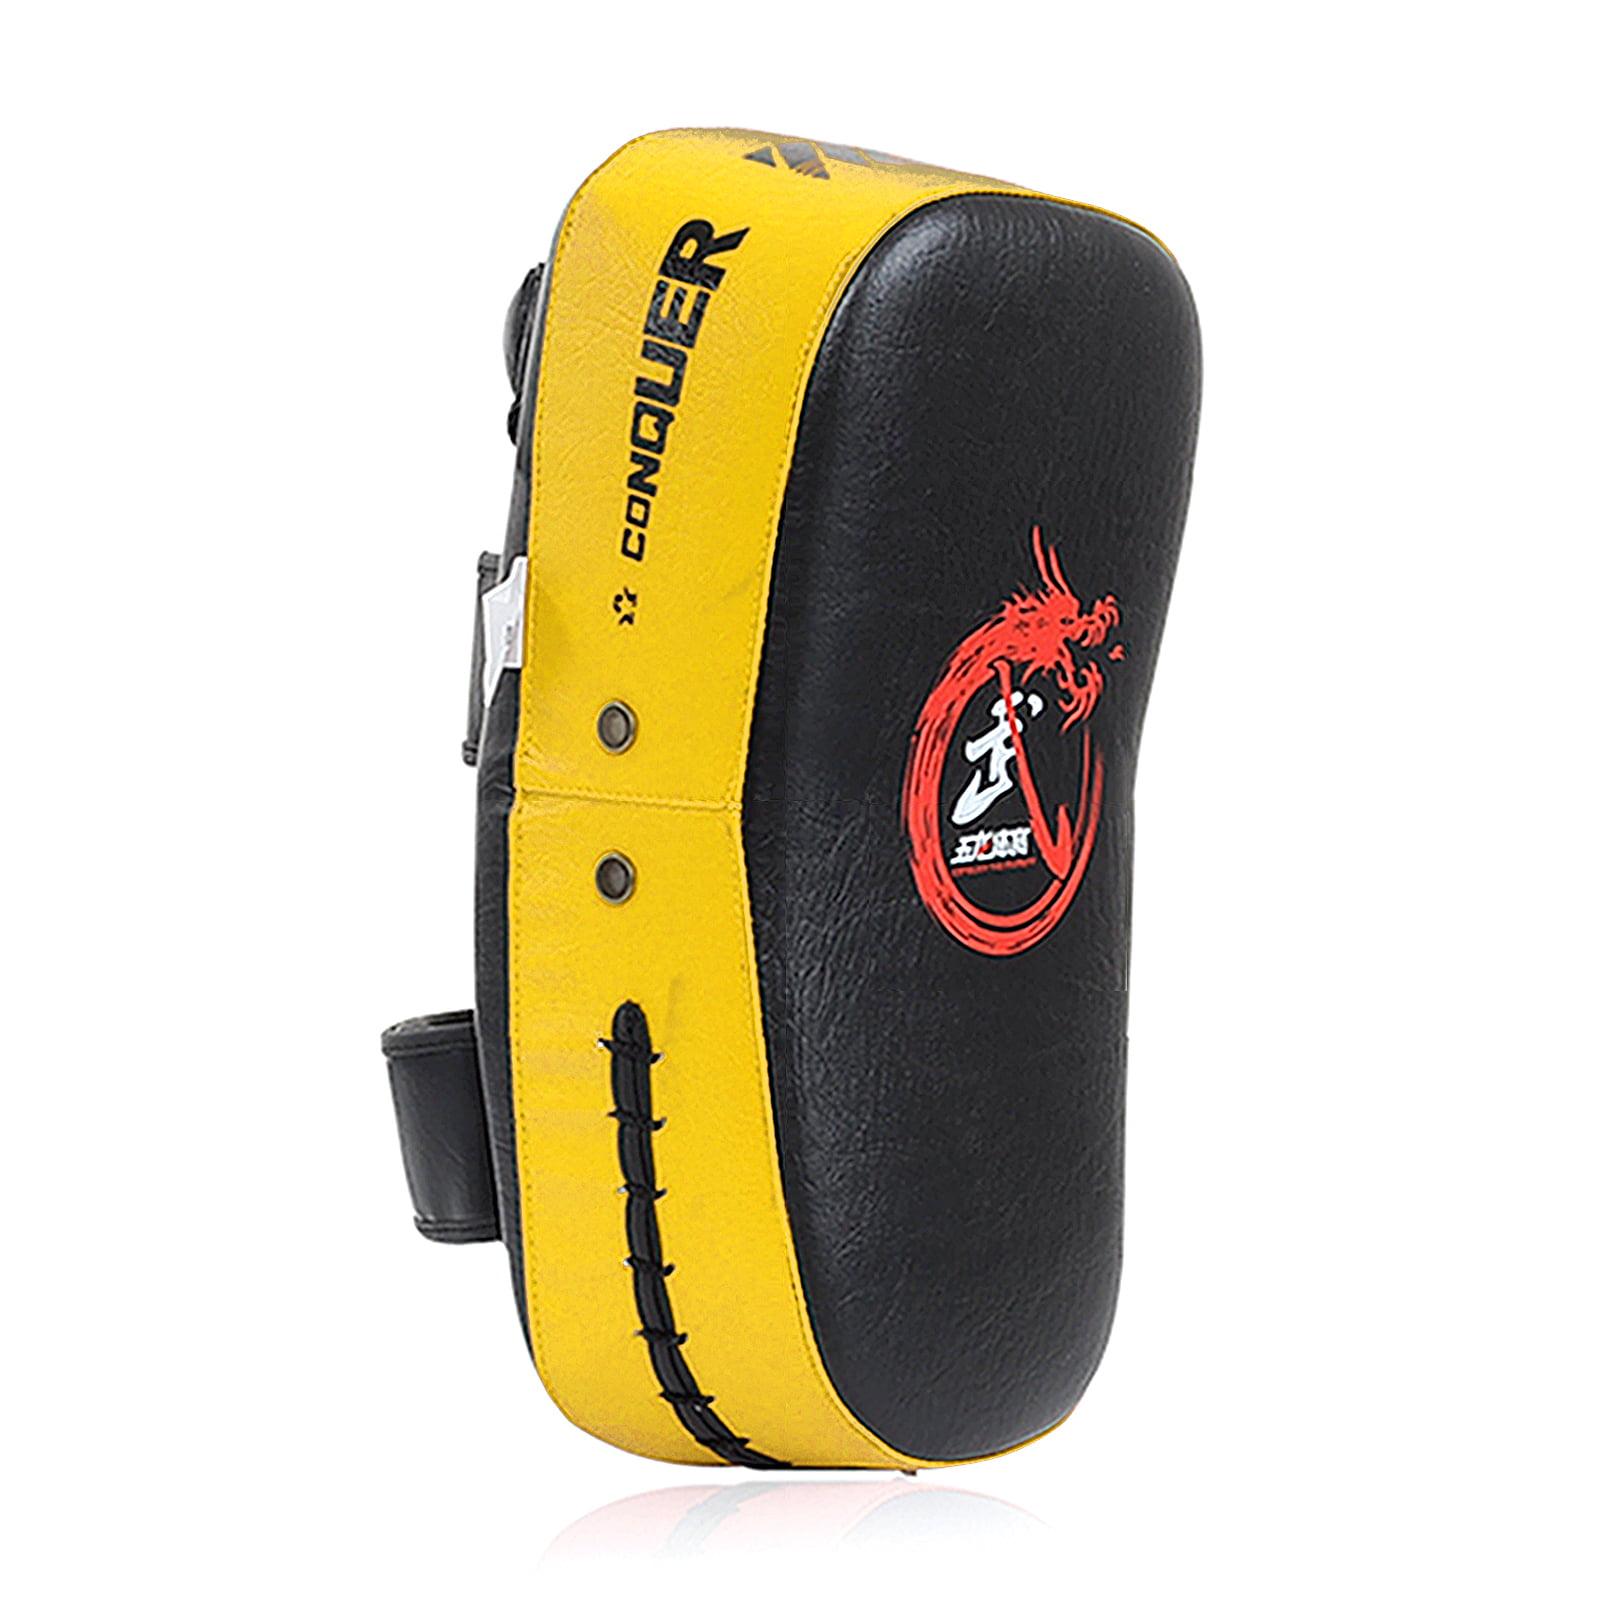 Cheerwing PU Leather Strike Shield Curved Focus Training Target Punch Mitt Karate Muay Thai Pad Kick Arm Target